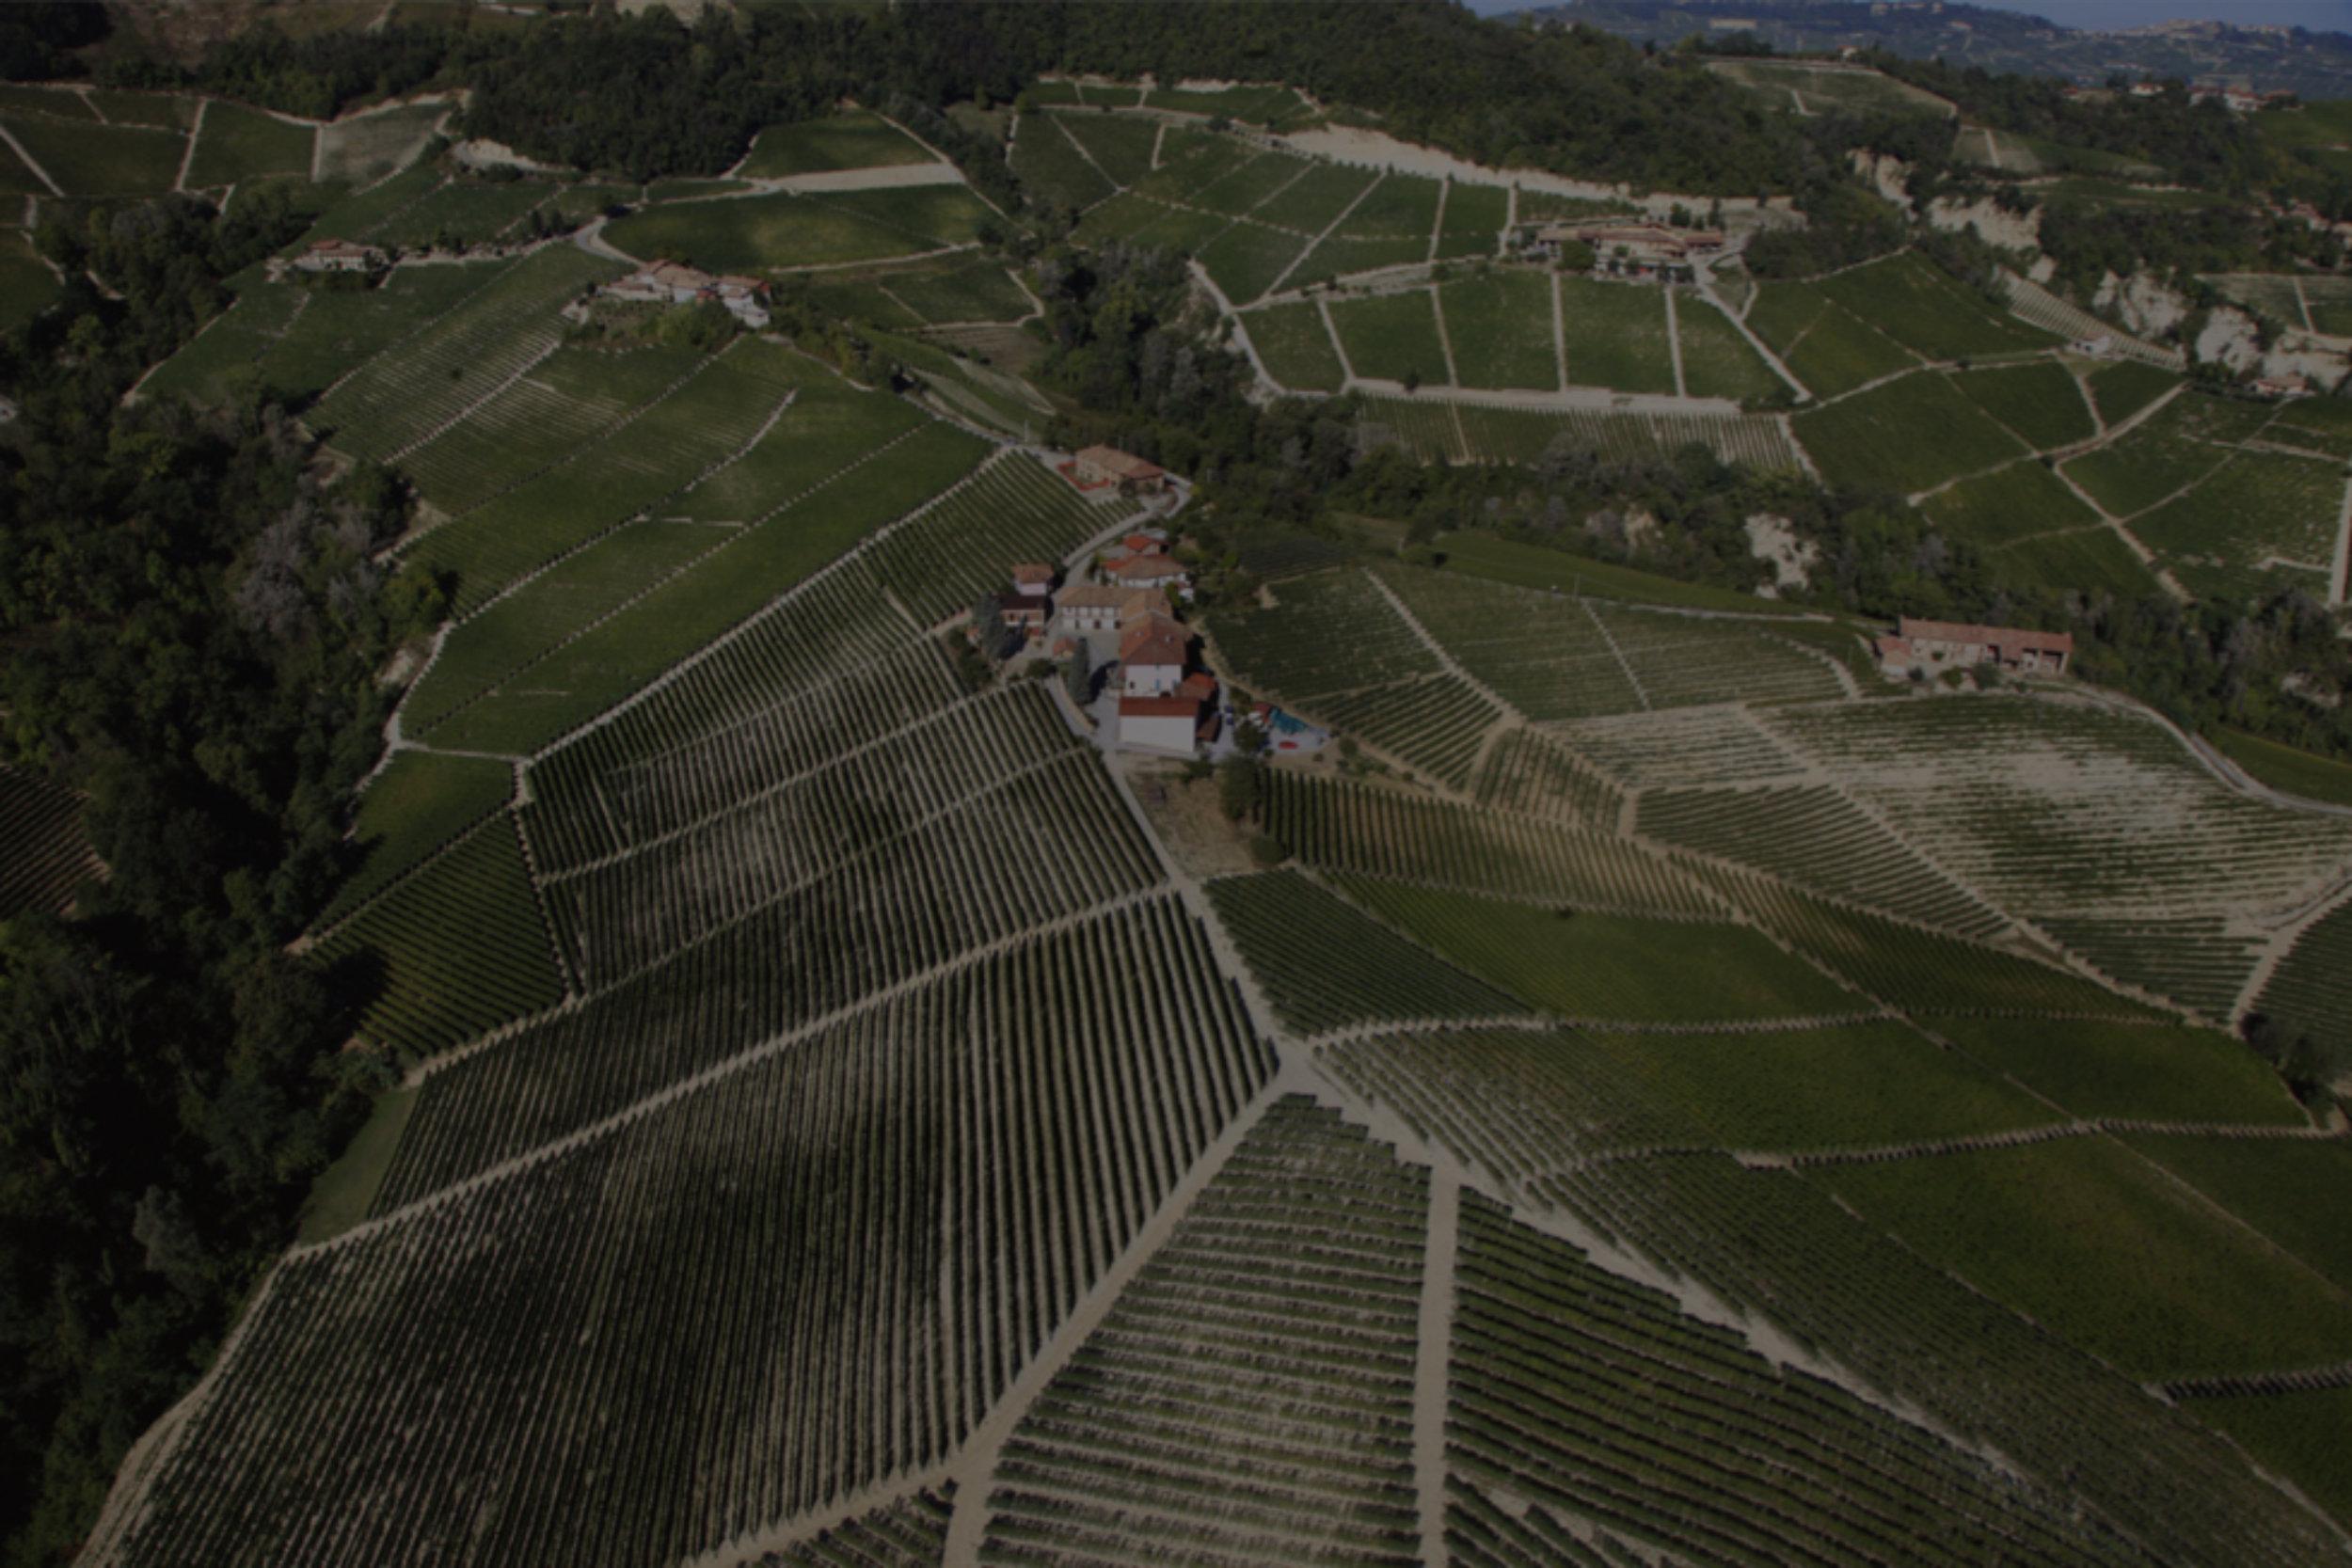 Paolo Conterno [Piedmont, ITA]